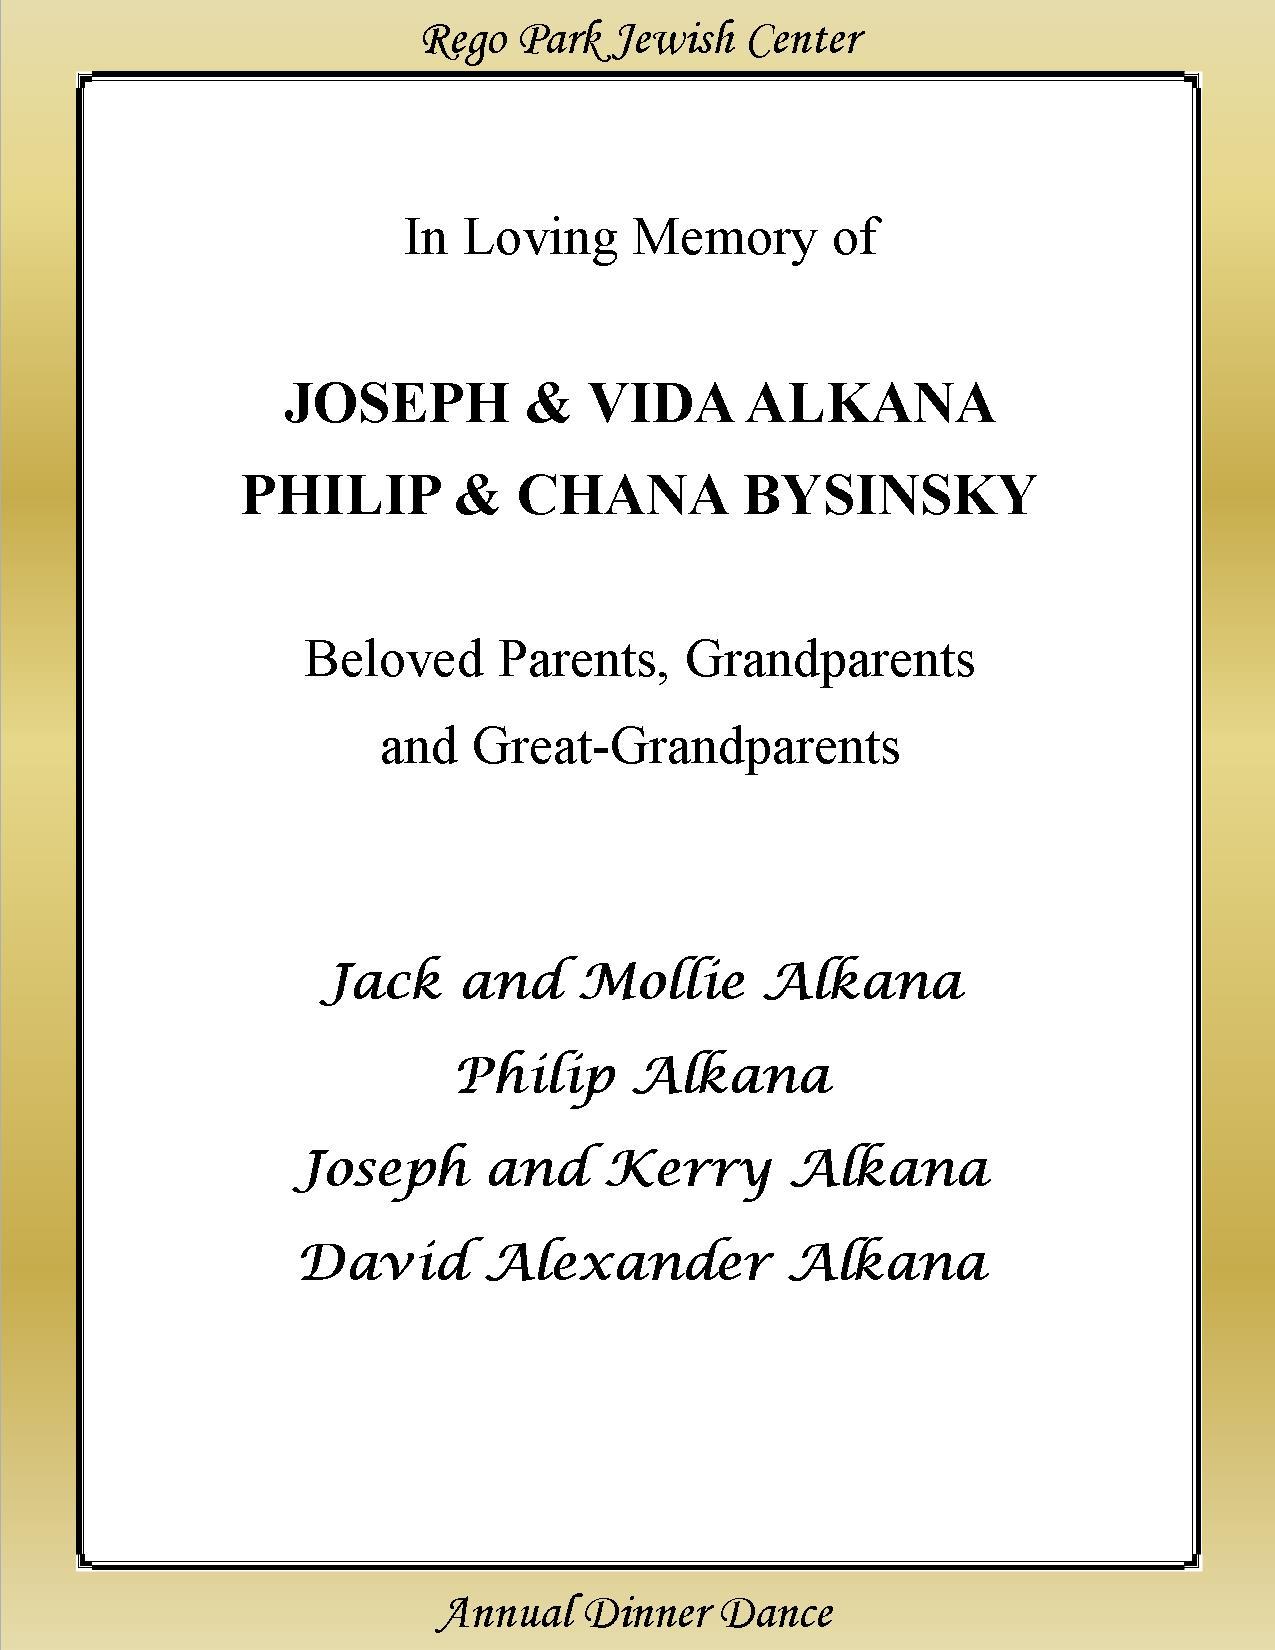 Gold Alkana page 16 - Copy.jpg